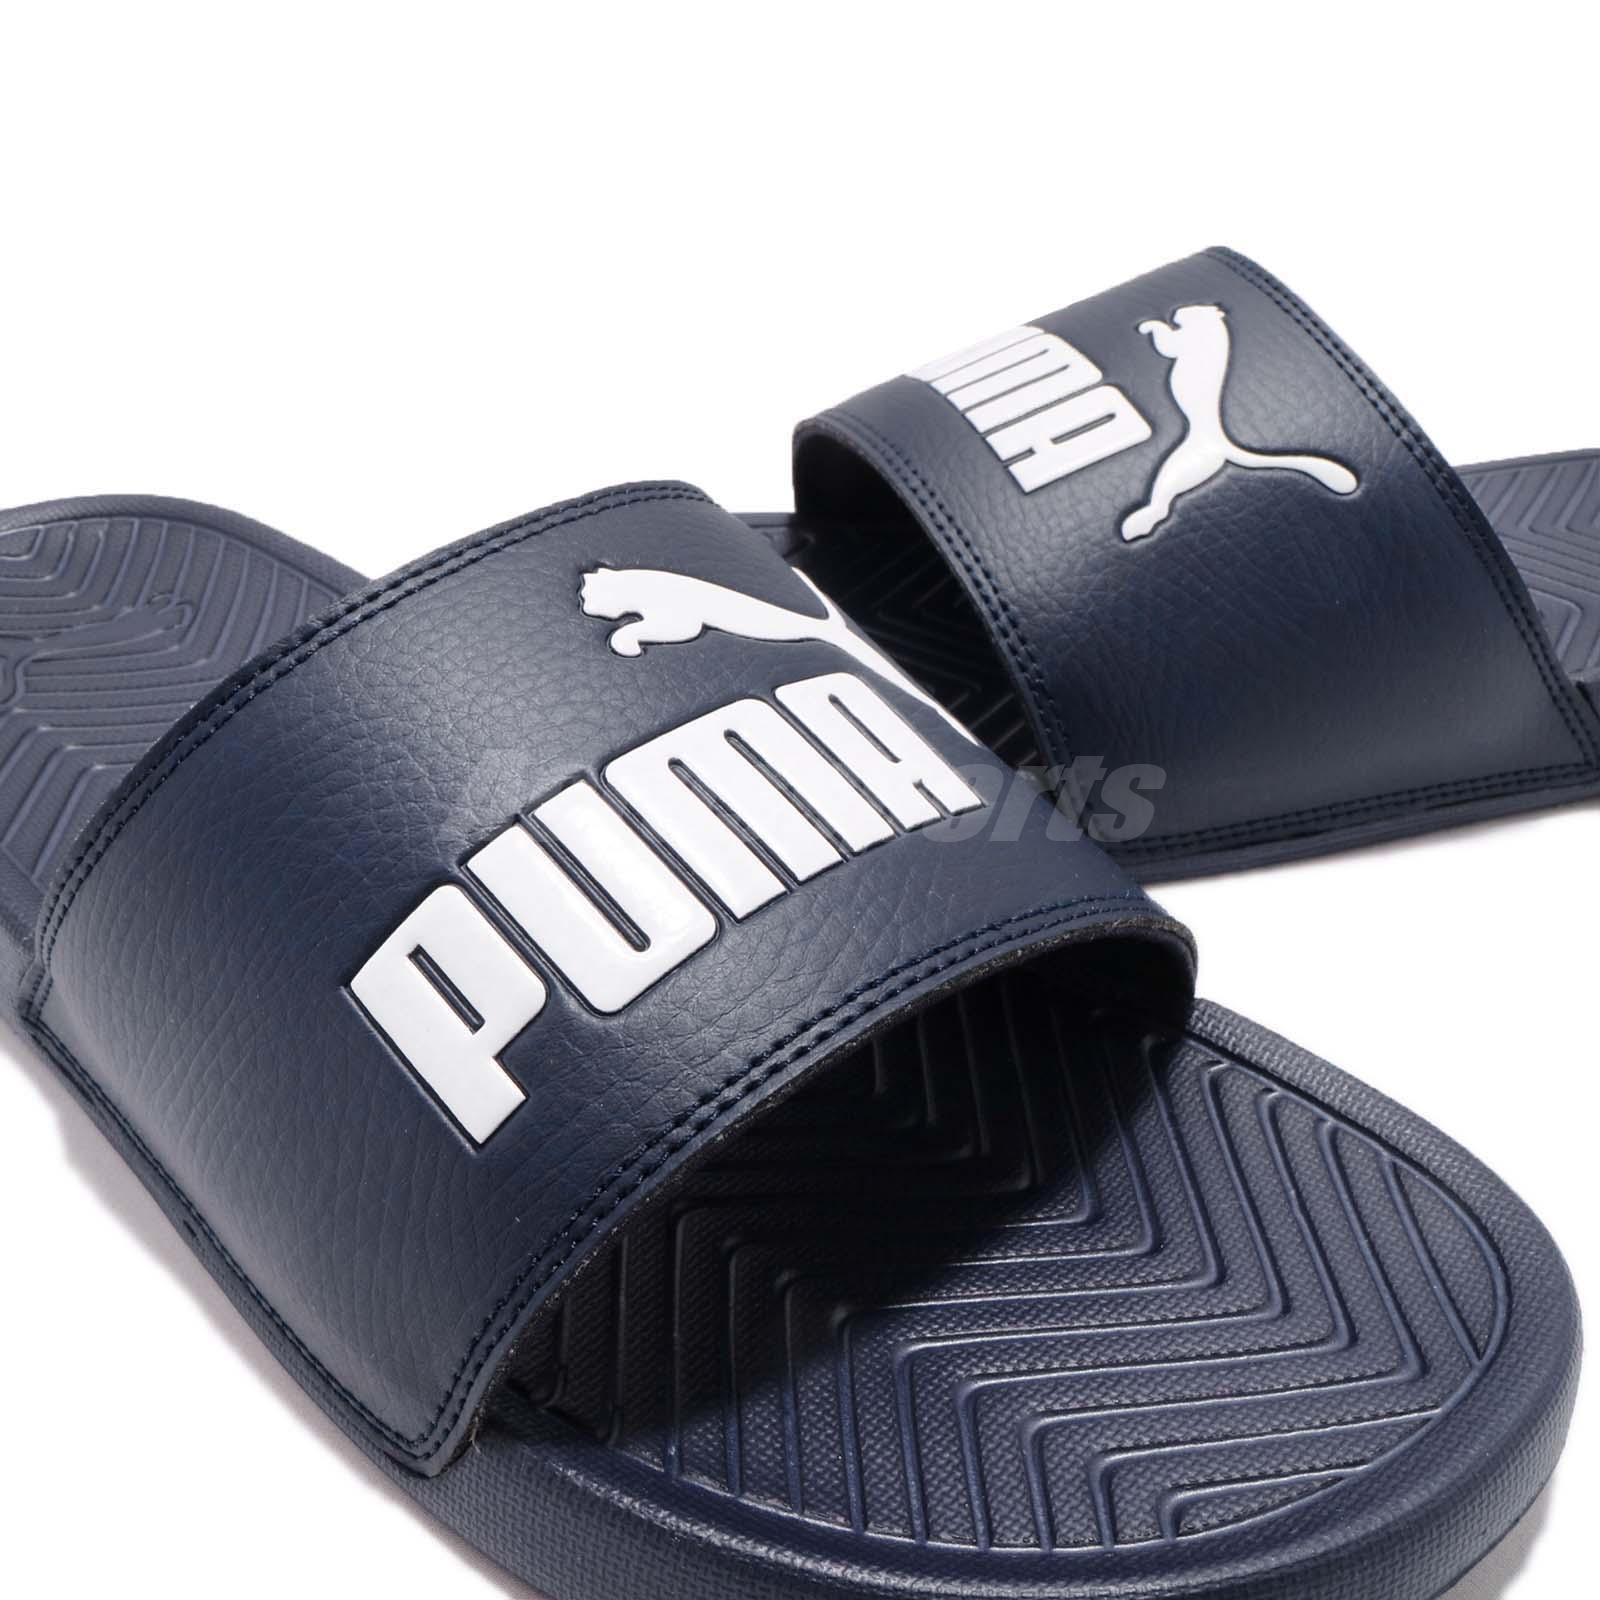 0a9e6ade92ff68 Puma Popcat Blue White Men Women Sandal Slippers Slides 360265-23